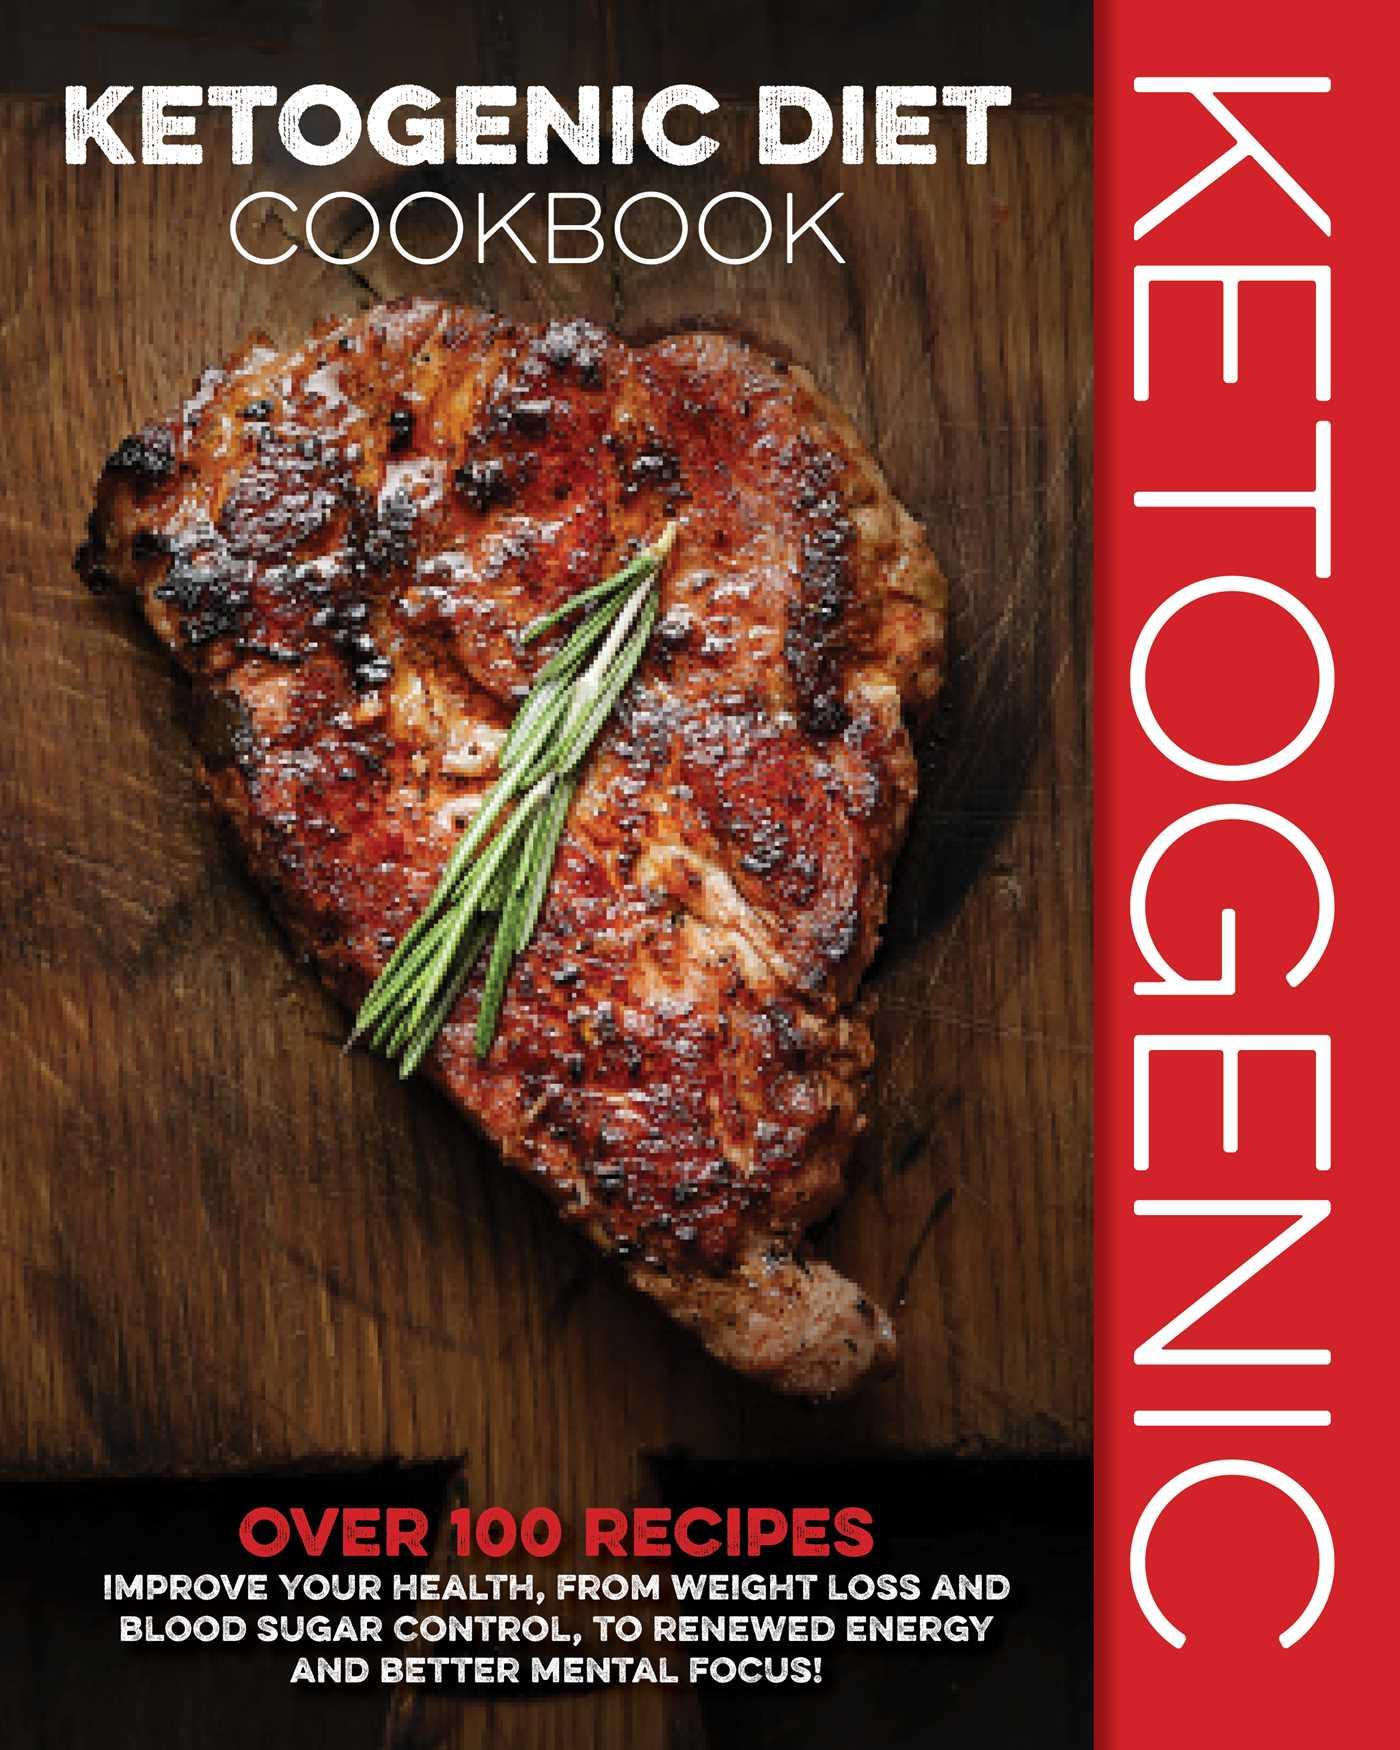 Ketogenic diet cookbook 9781604337945 hr